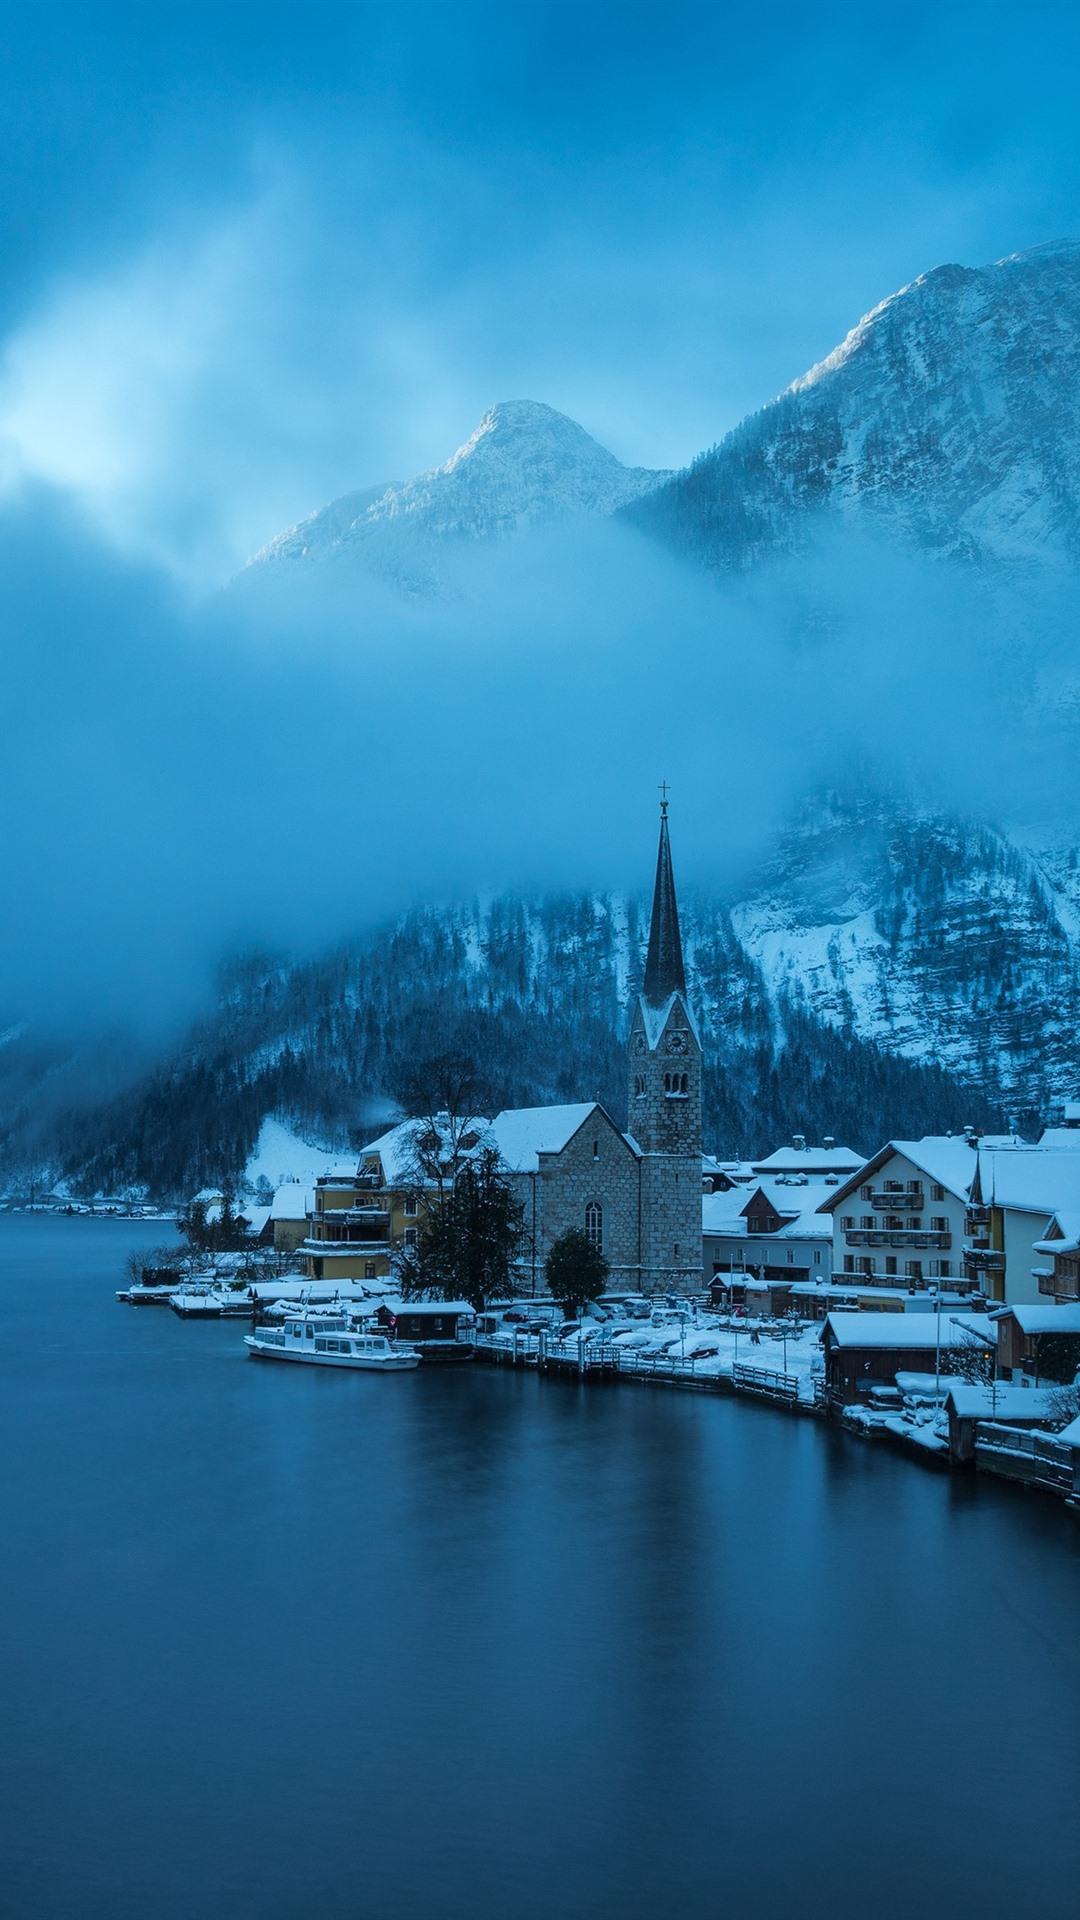 Hallstatt Austria Winter Snow Lake Mountains Fog